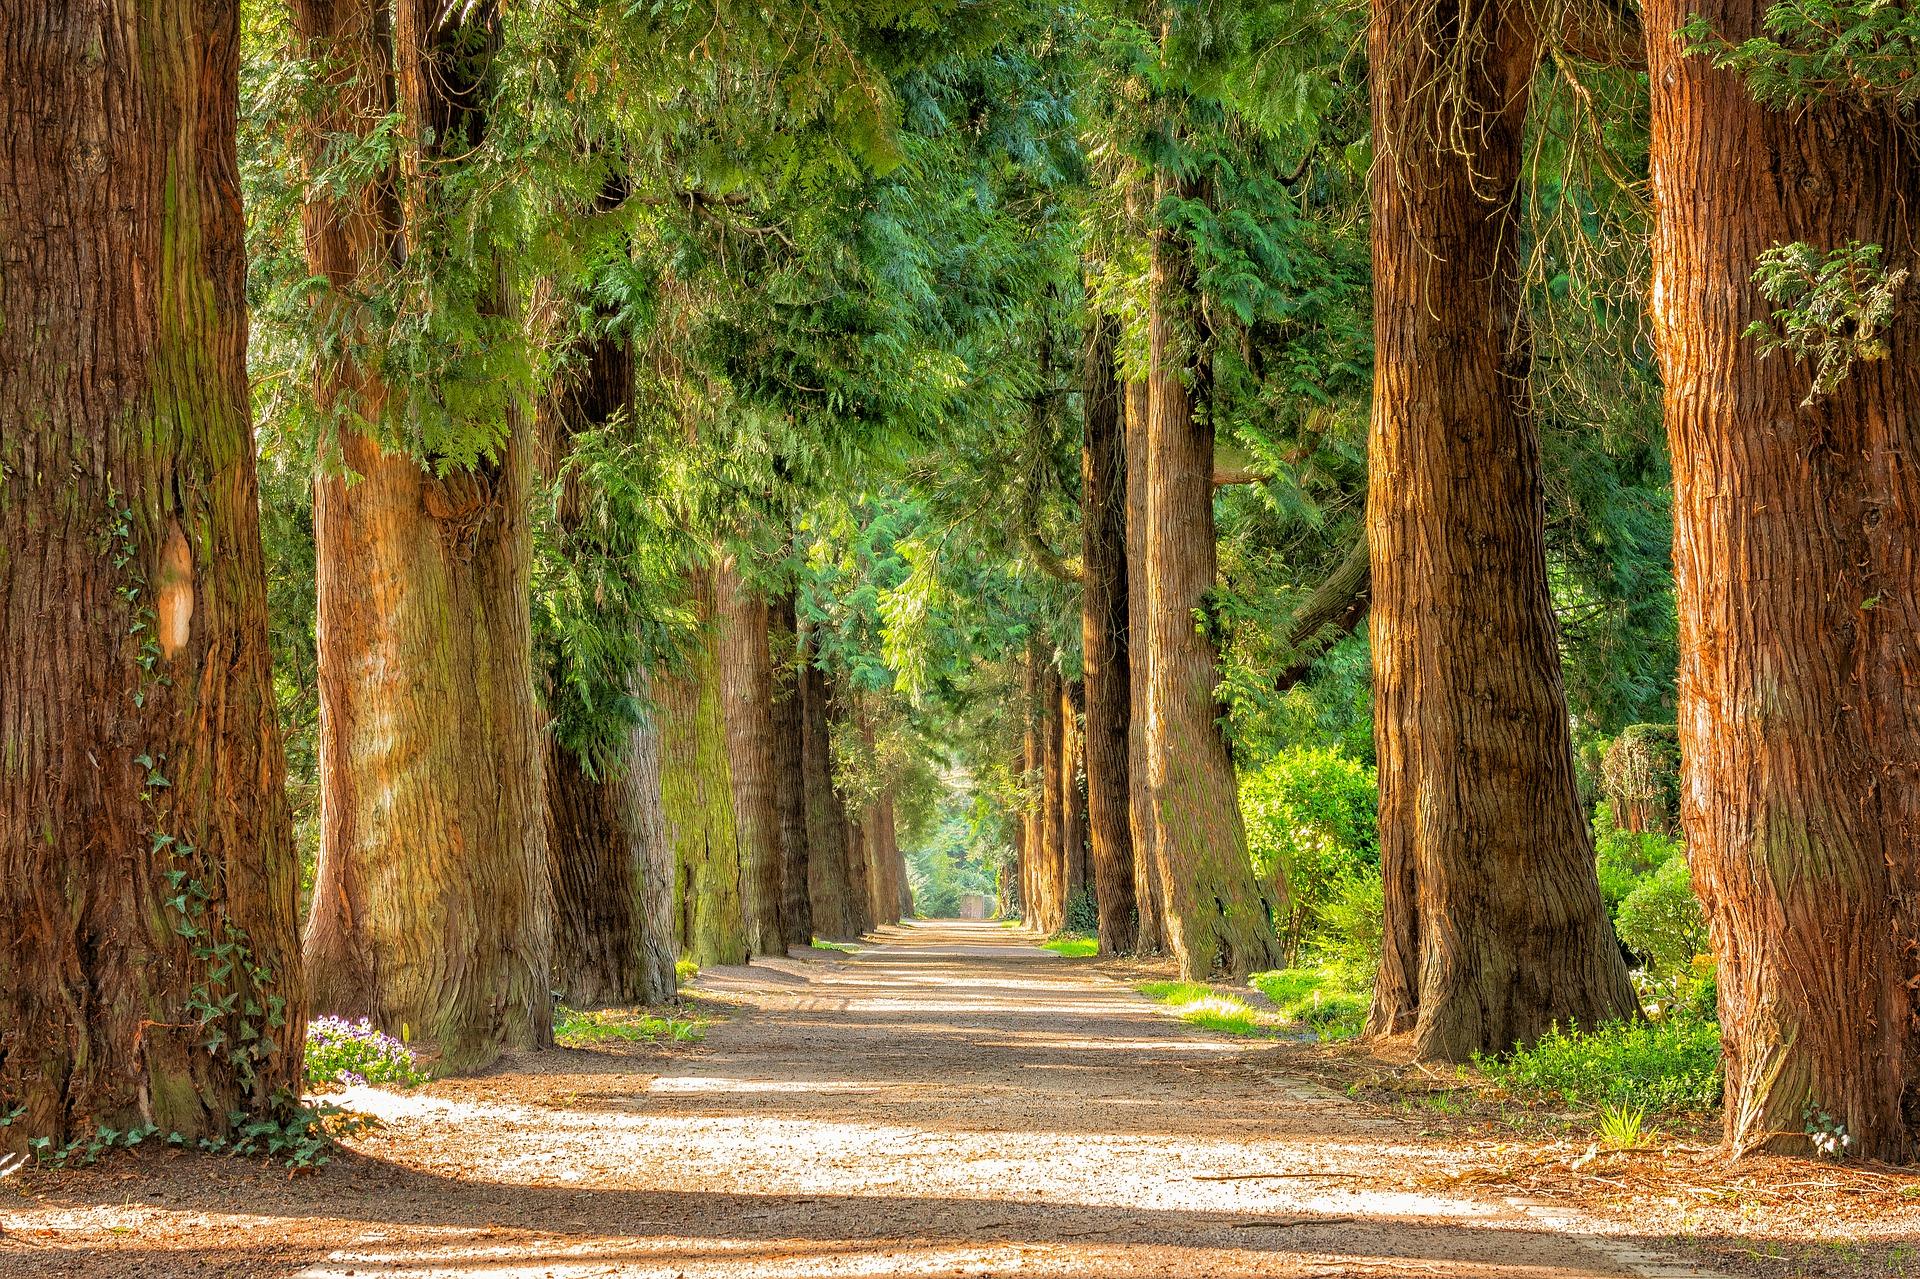 Walk the Nature Trail